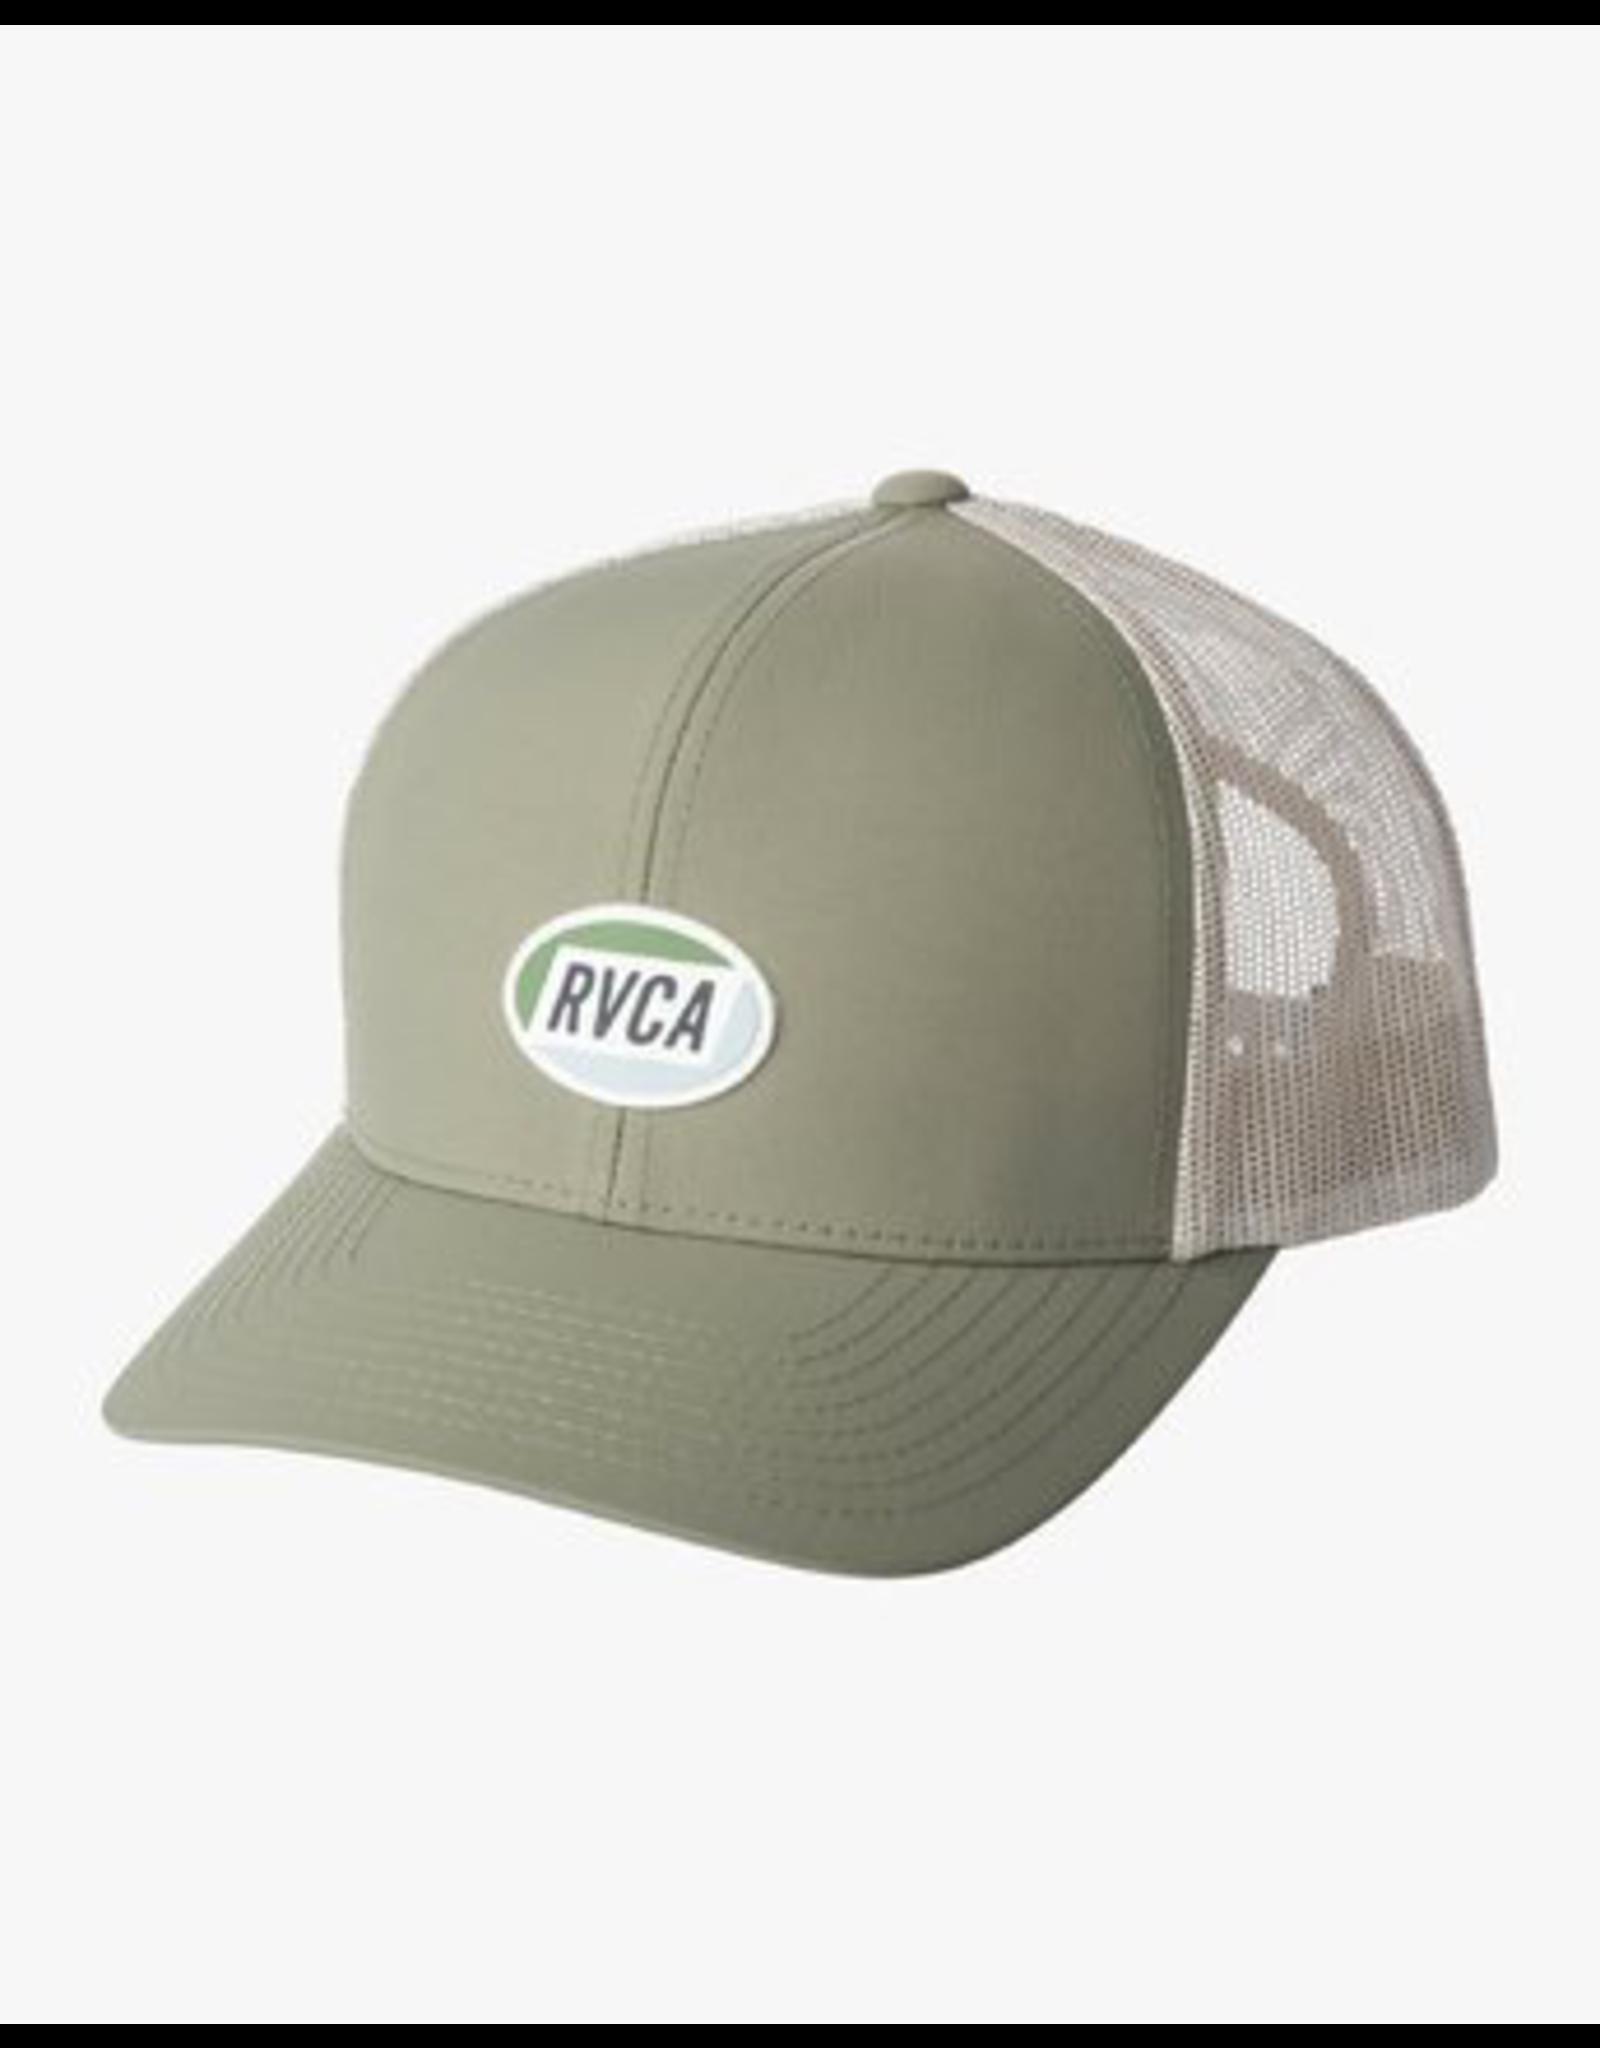 RVCA CRTEX TRUCKER